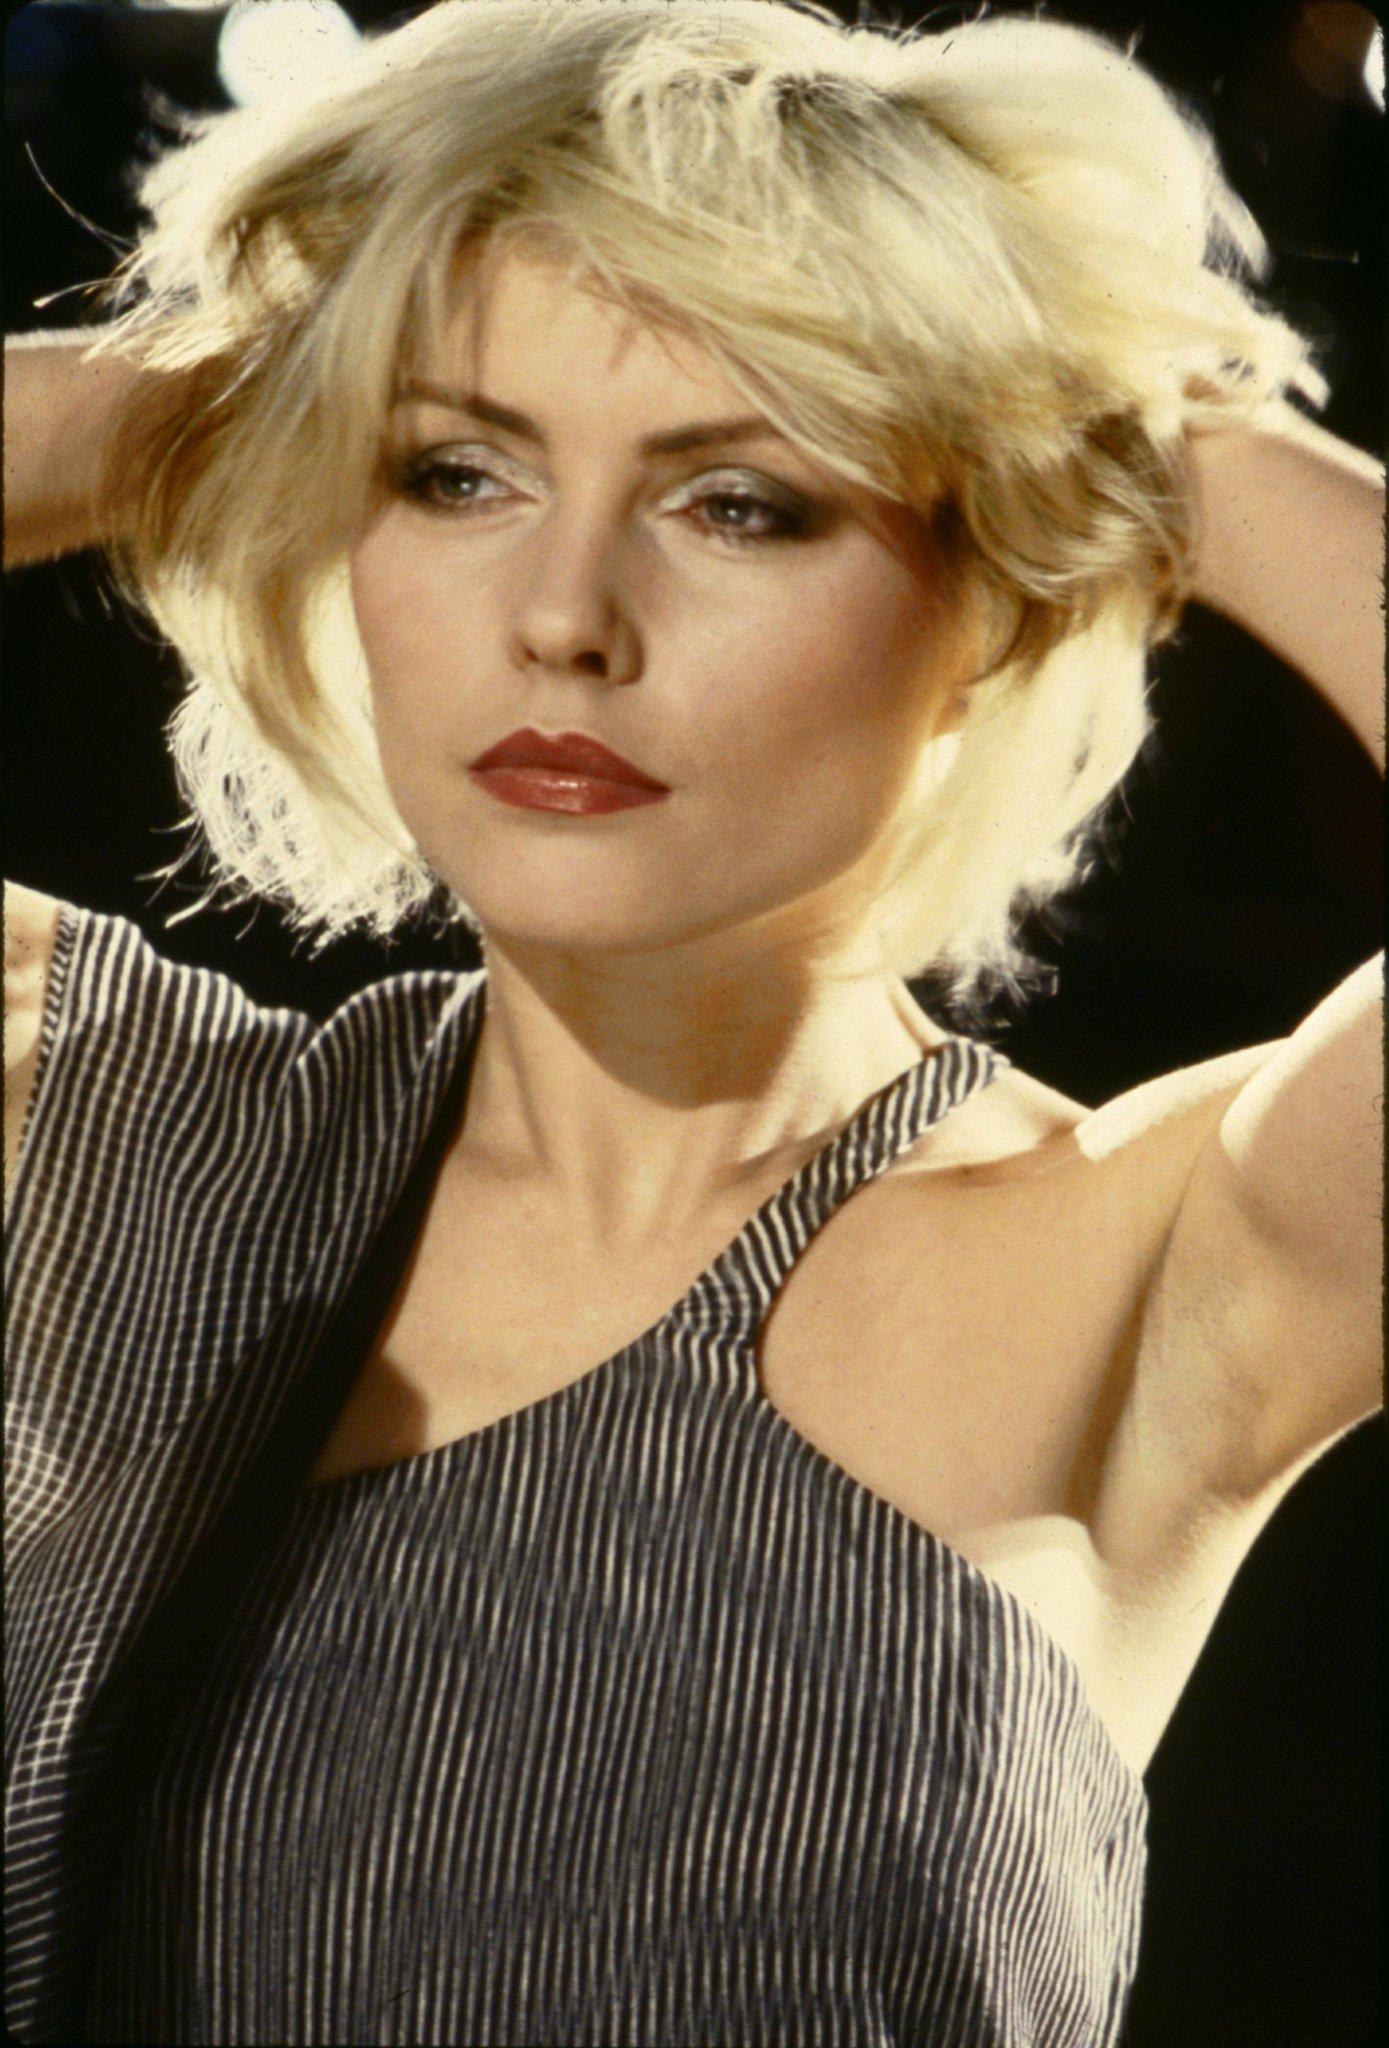 OTD  in  1945 Deborah Harry, singer (Blondie-Heart of Glass), born in Miami, Florida   Happy  Birthday